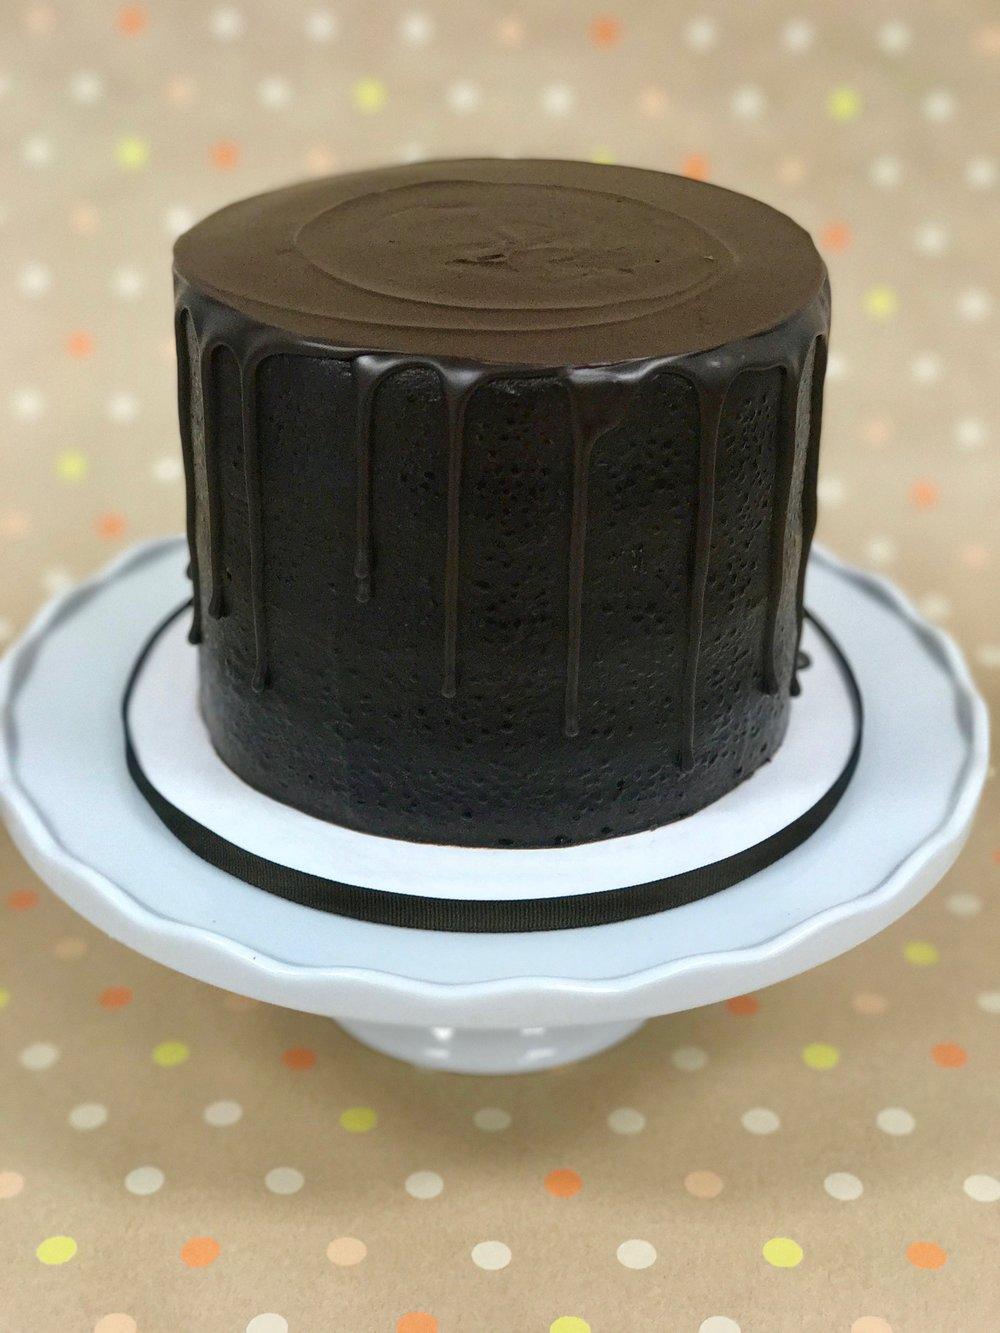 Triple Chocolate - Cake: ChocolateFilling: Chocolate FudgeFrosting: Chocolate Fudge and dark chocolate ganache